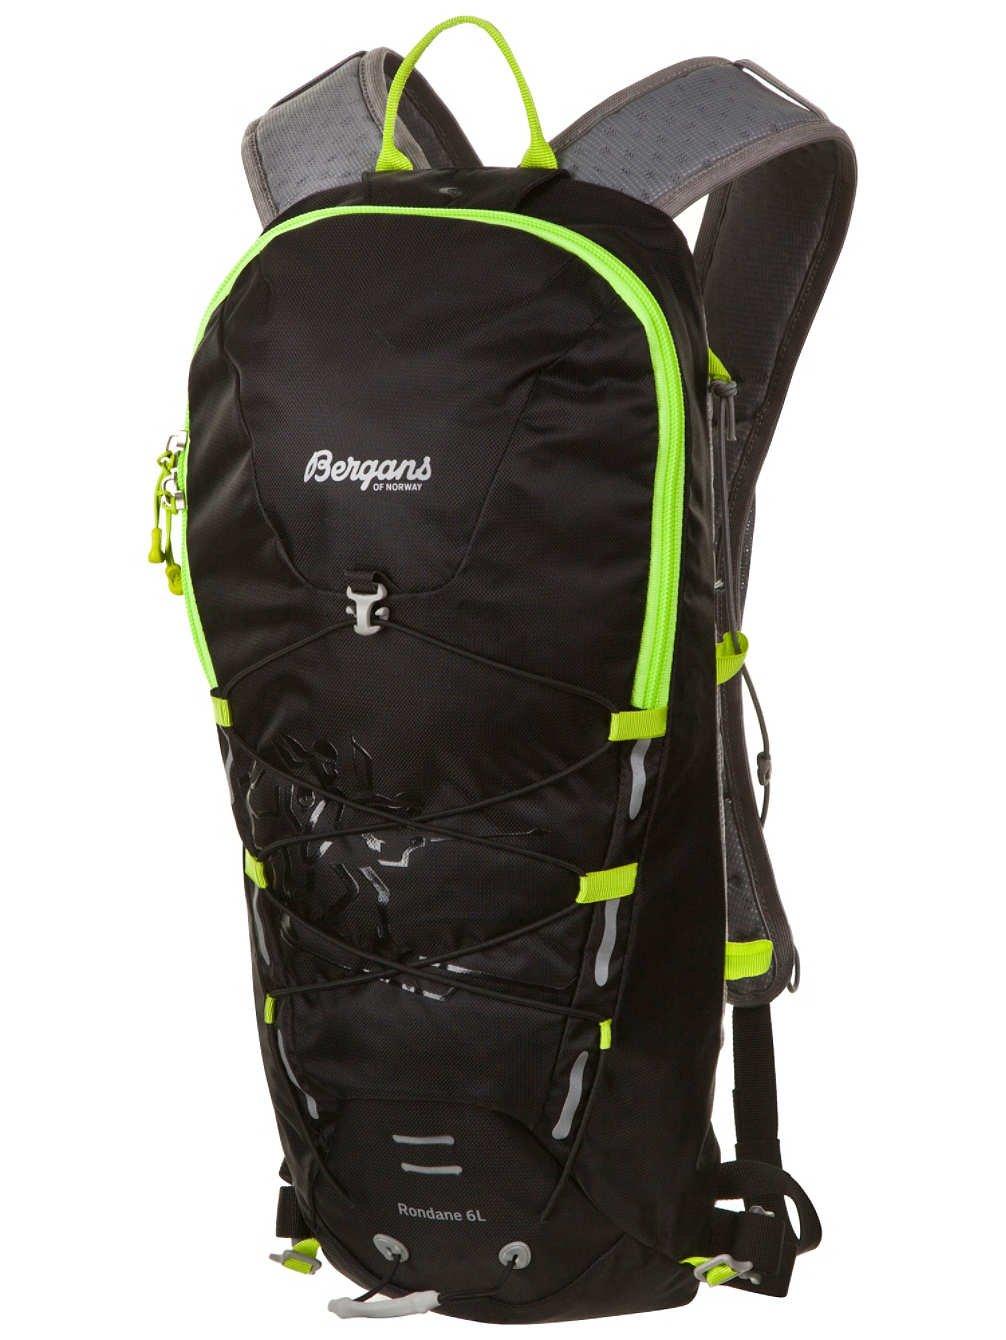 Bergans Tourenrucksack Rondane 6L Backpack